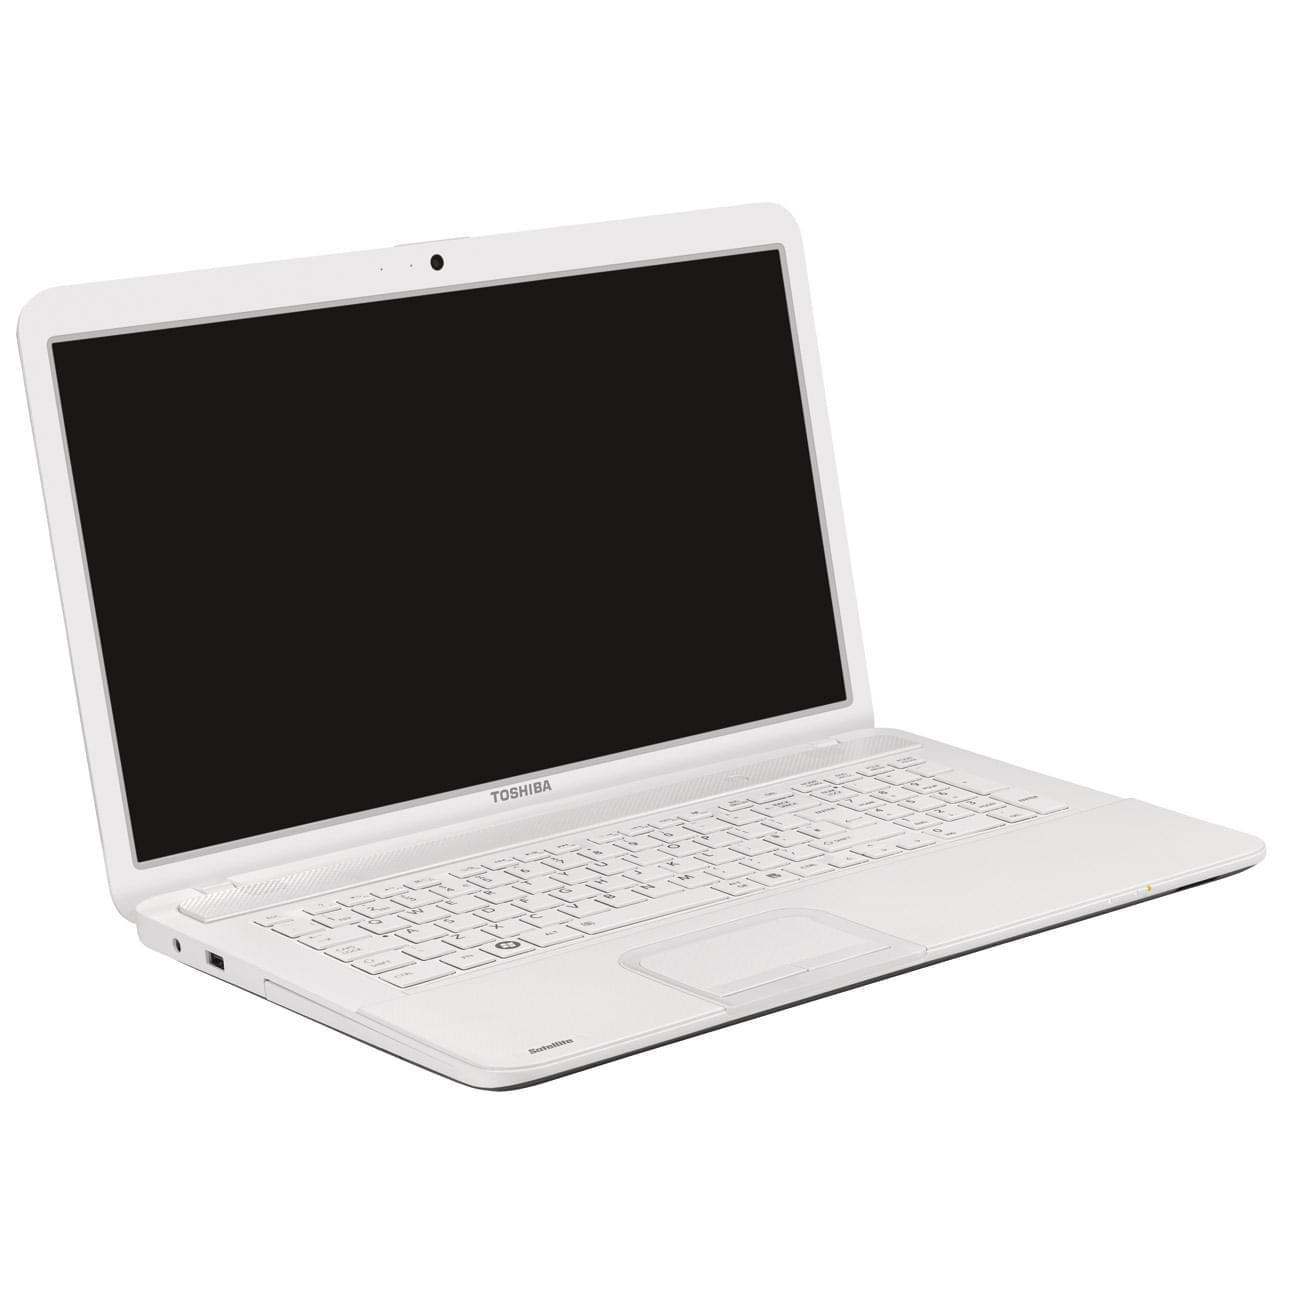 Toshiba C875-14R Blanc (PSCBCE-033002FR) - Achat / Vente PC Portable sur Cybertek.fr - 0